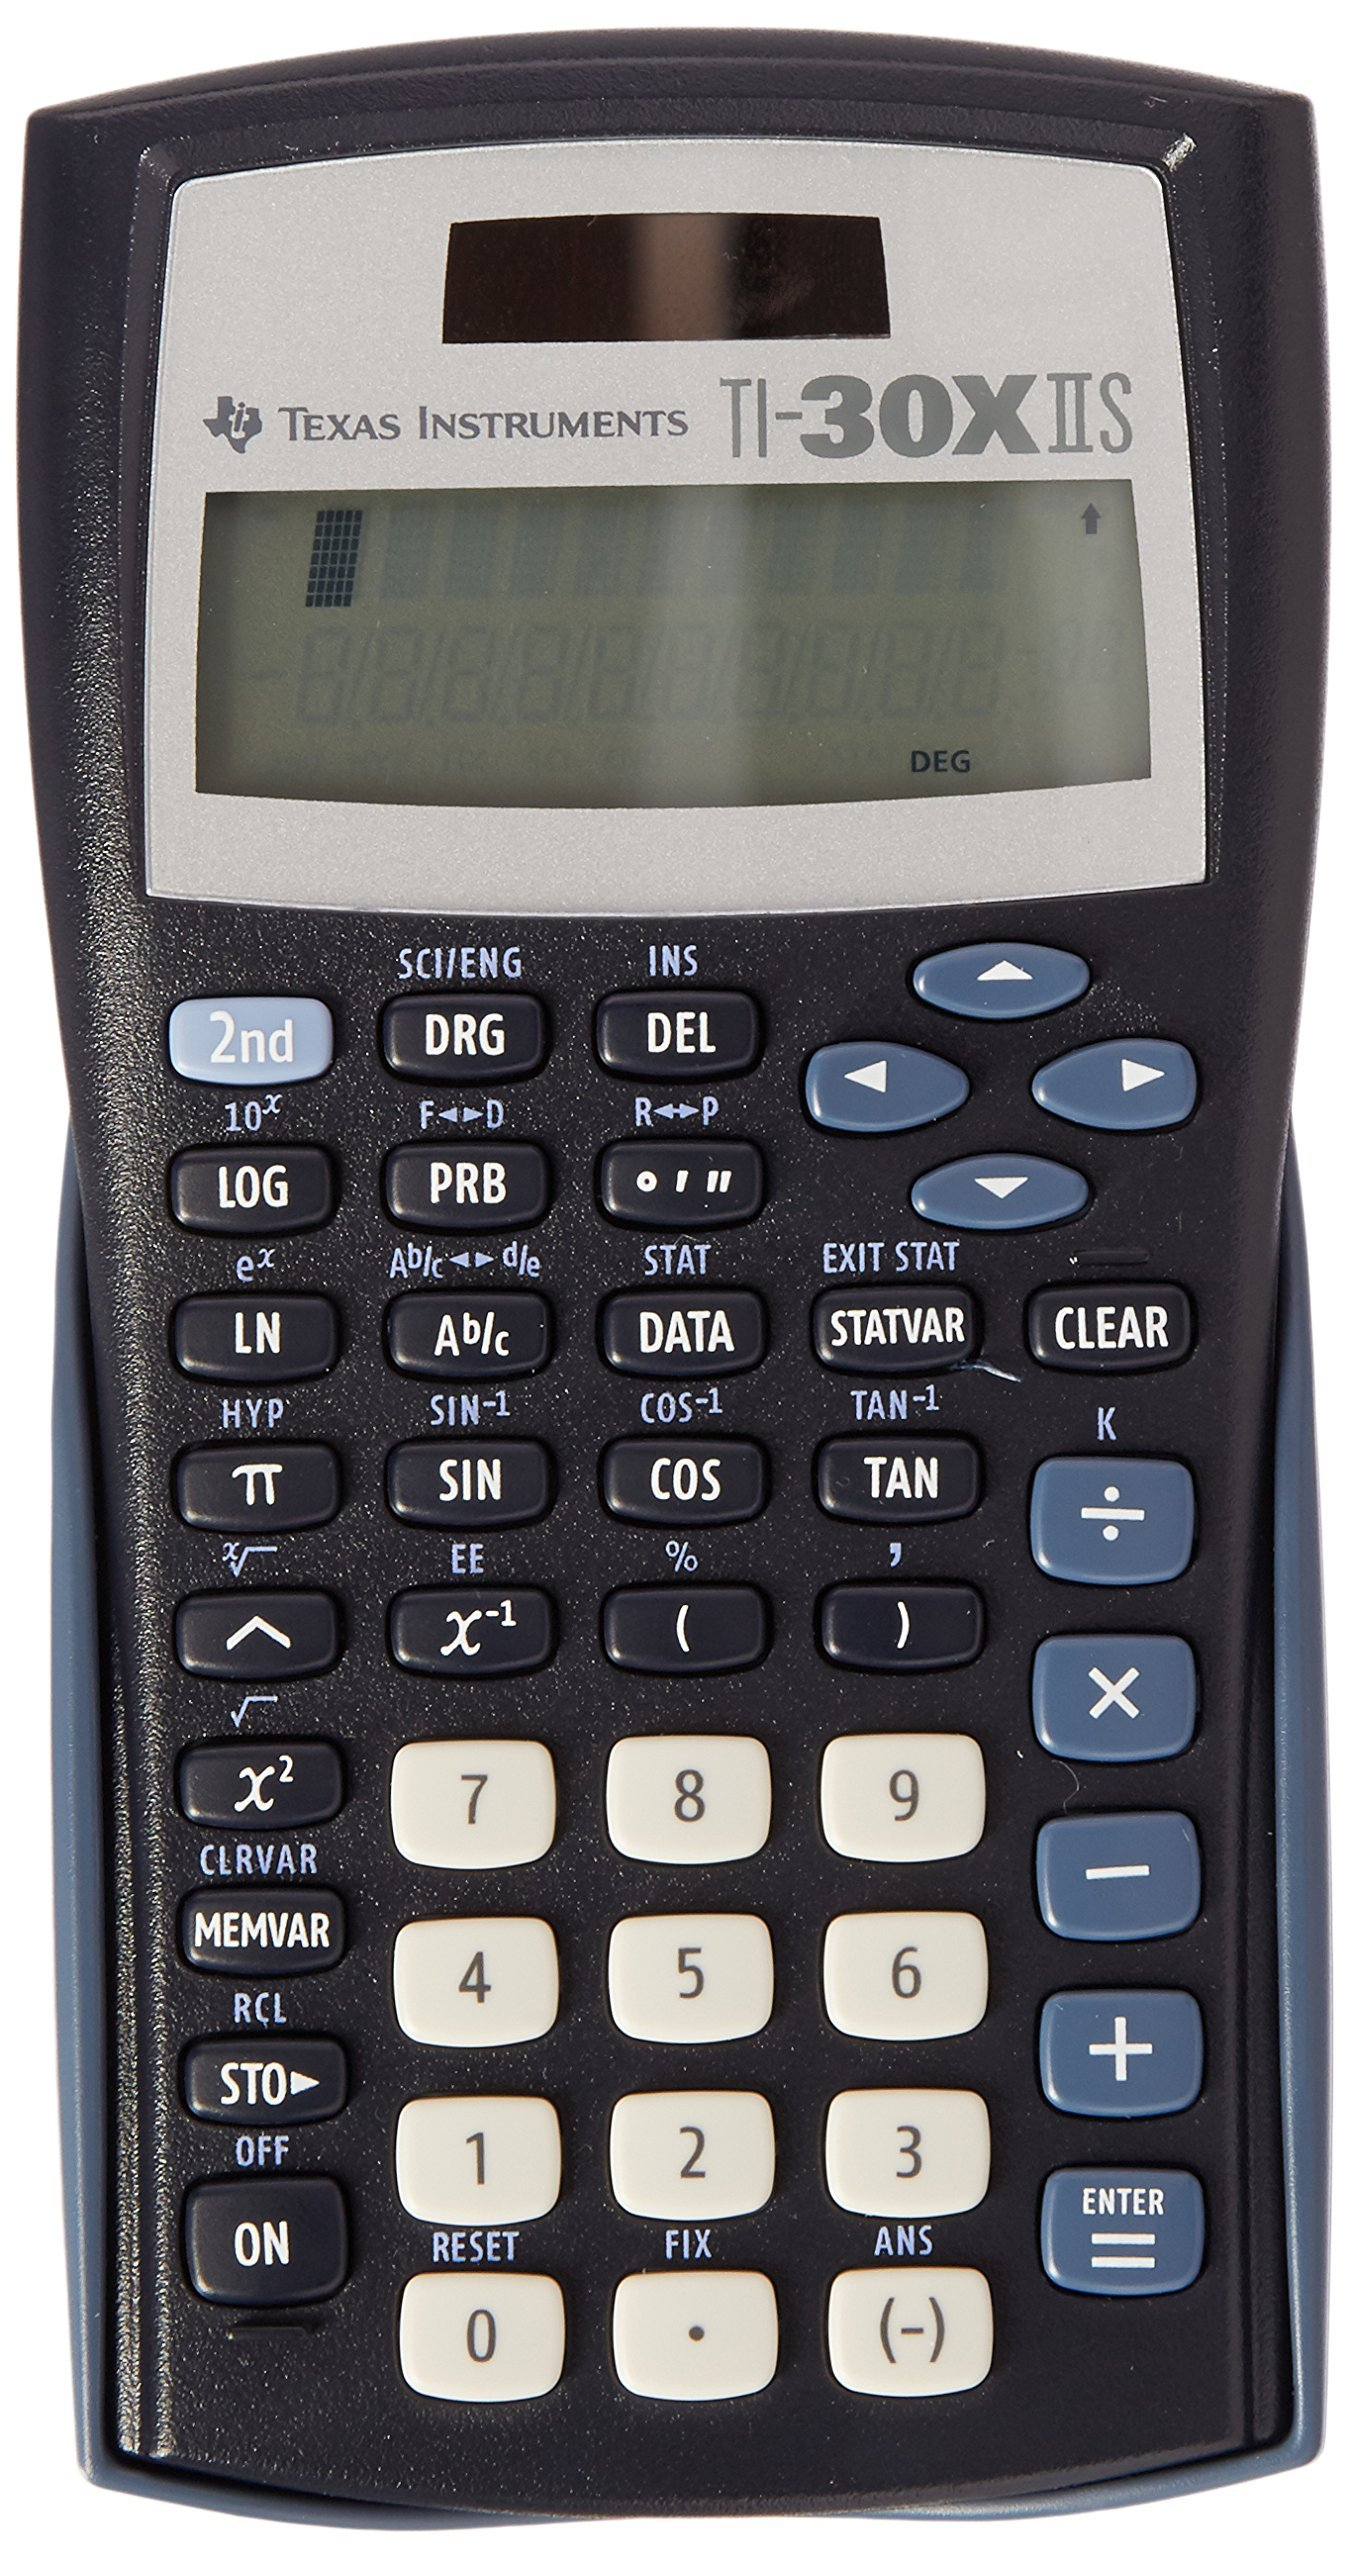 Texas Instruments 30XIIS/TKT Calculator Teachers Kit by Texas Instruments